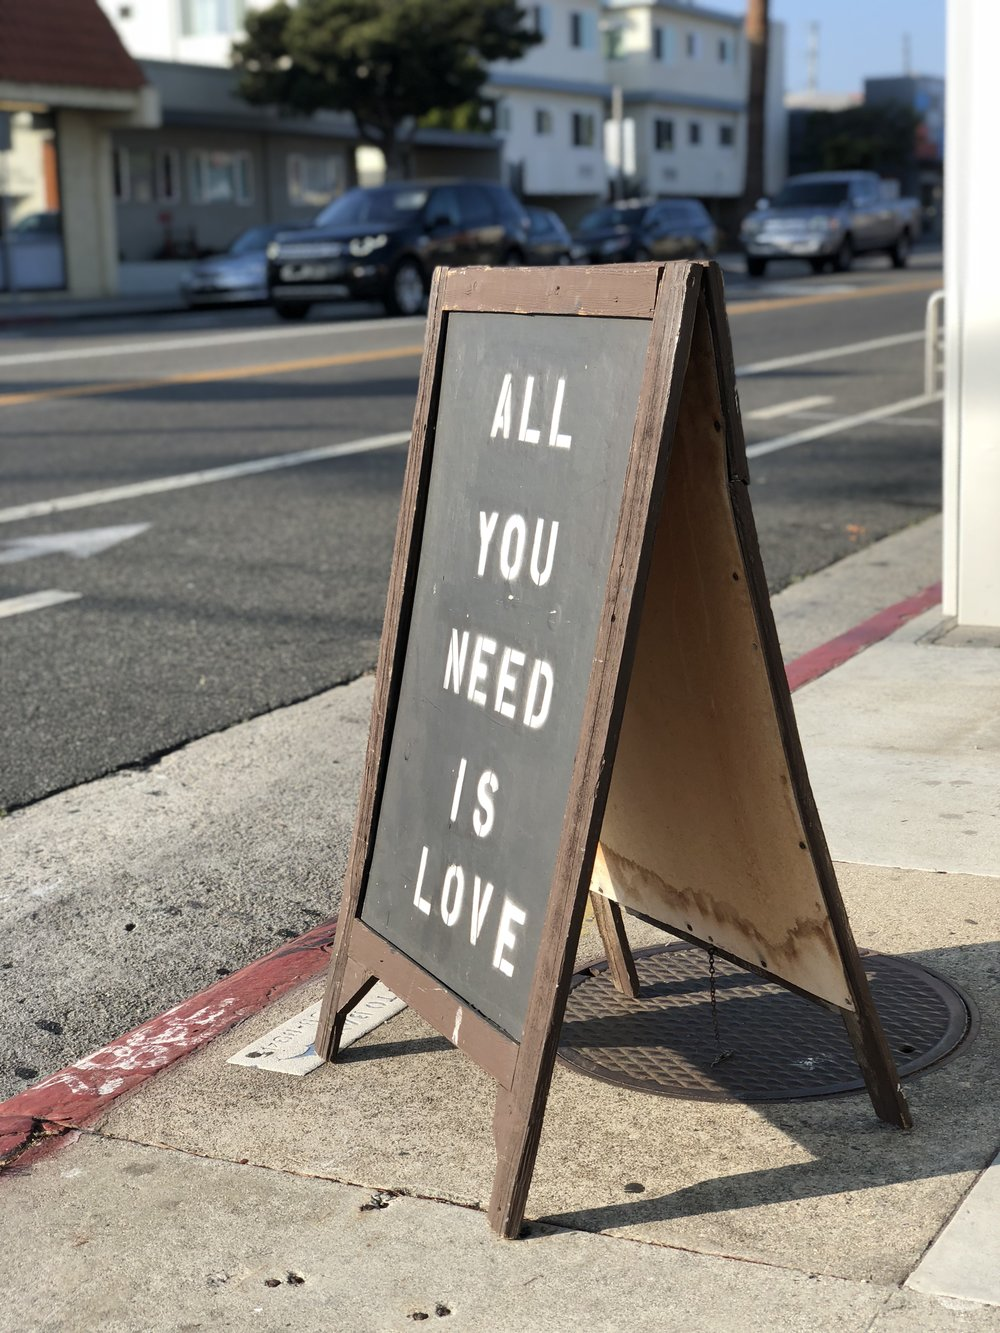 Santa Monica, CA - June 2018 - Walking to get a bottle of wine - Shot on iPhone X